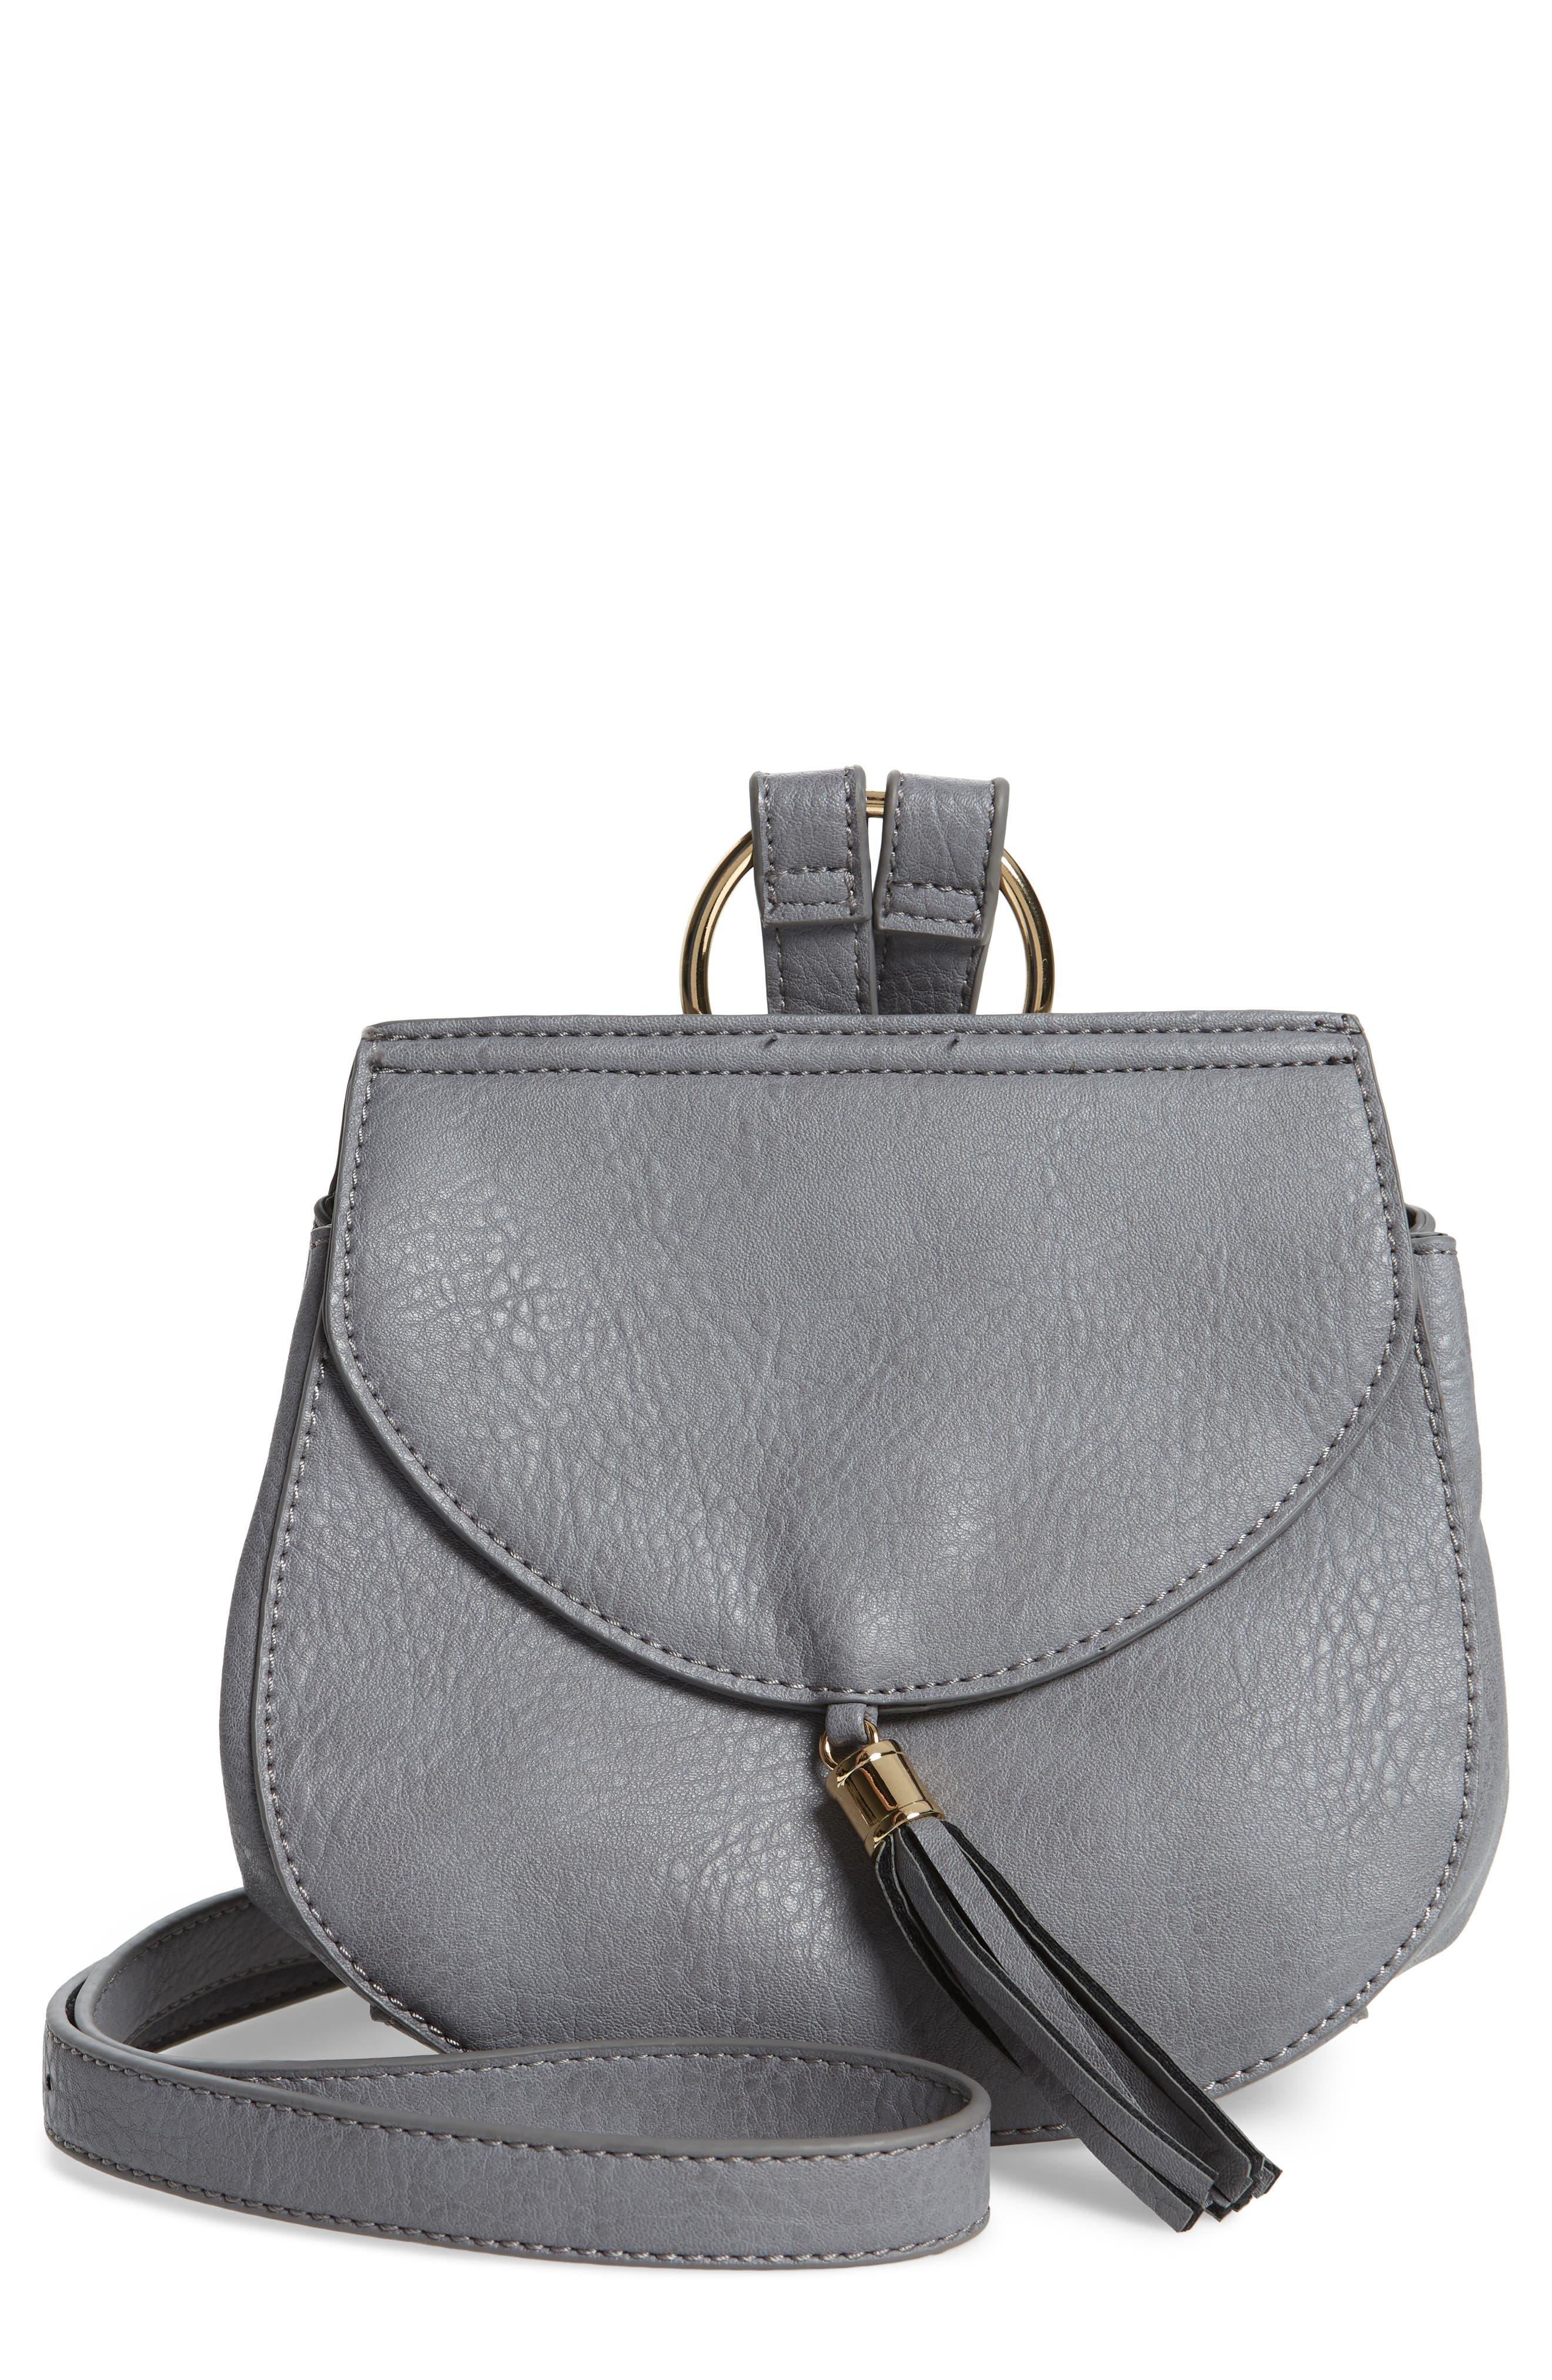 Tassel Faux Leather Crossbody Saddle Bag,                             Main thumbnail 1, color,